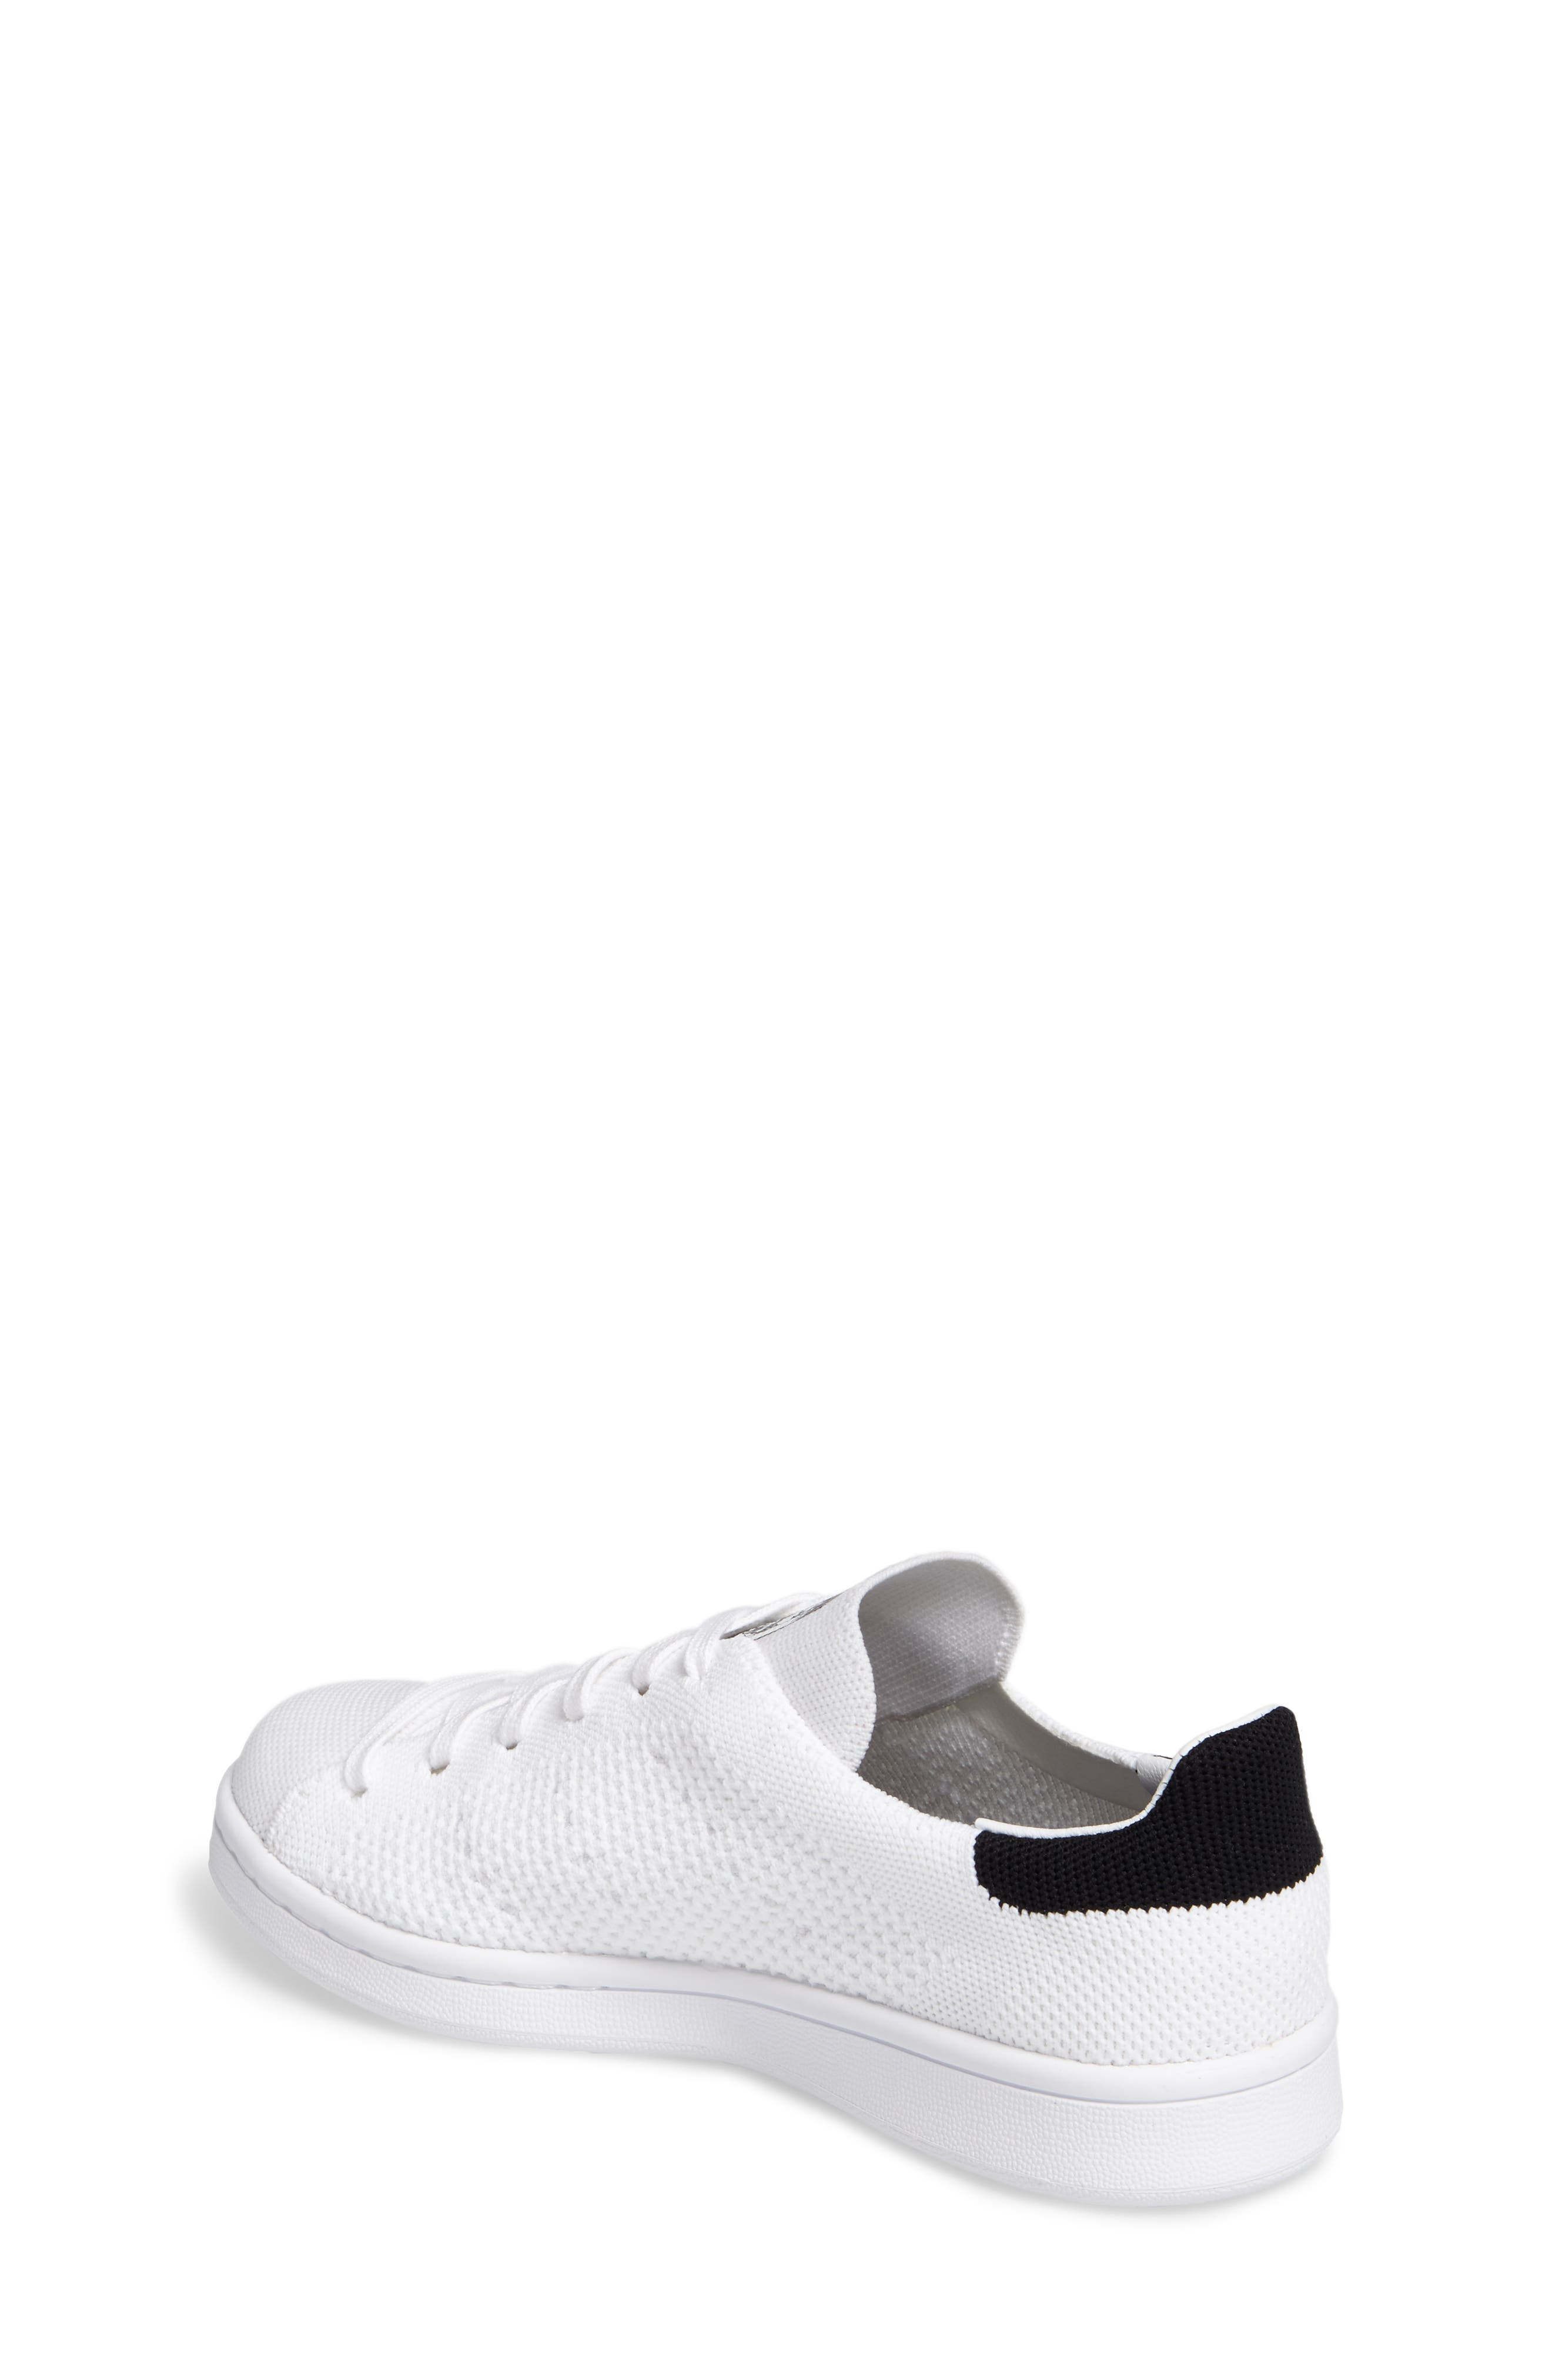 Stan Smith Primeknit Sneaker,                             Alternate thumbnail 2, color,                             Footwear White